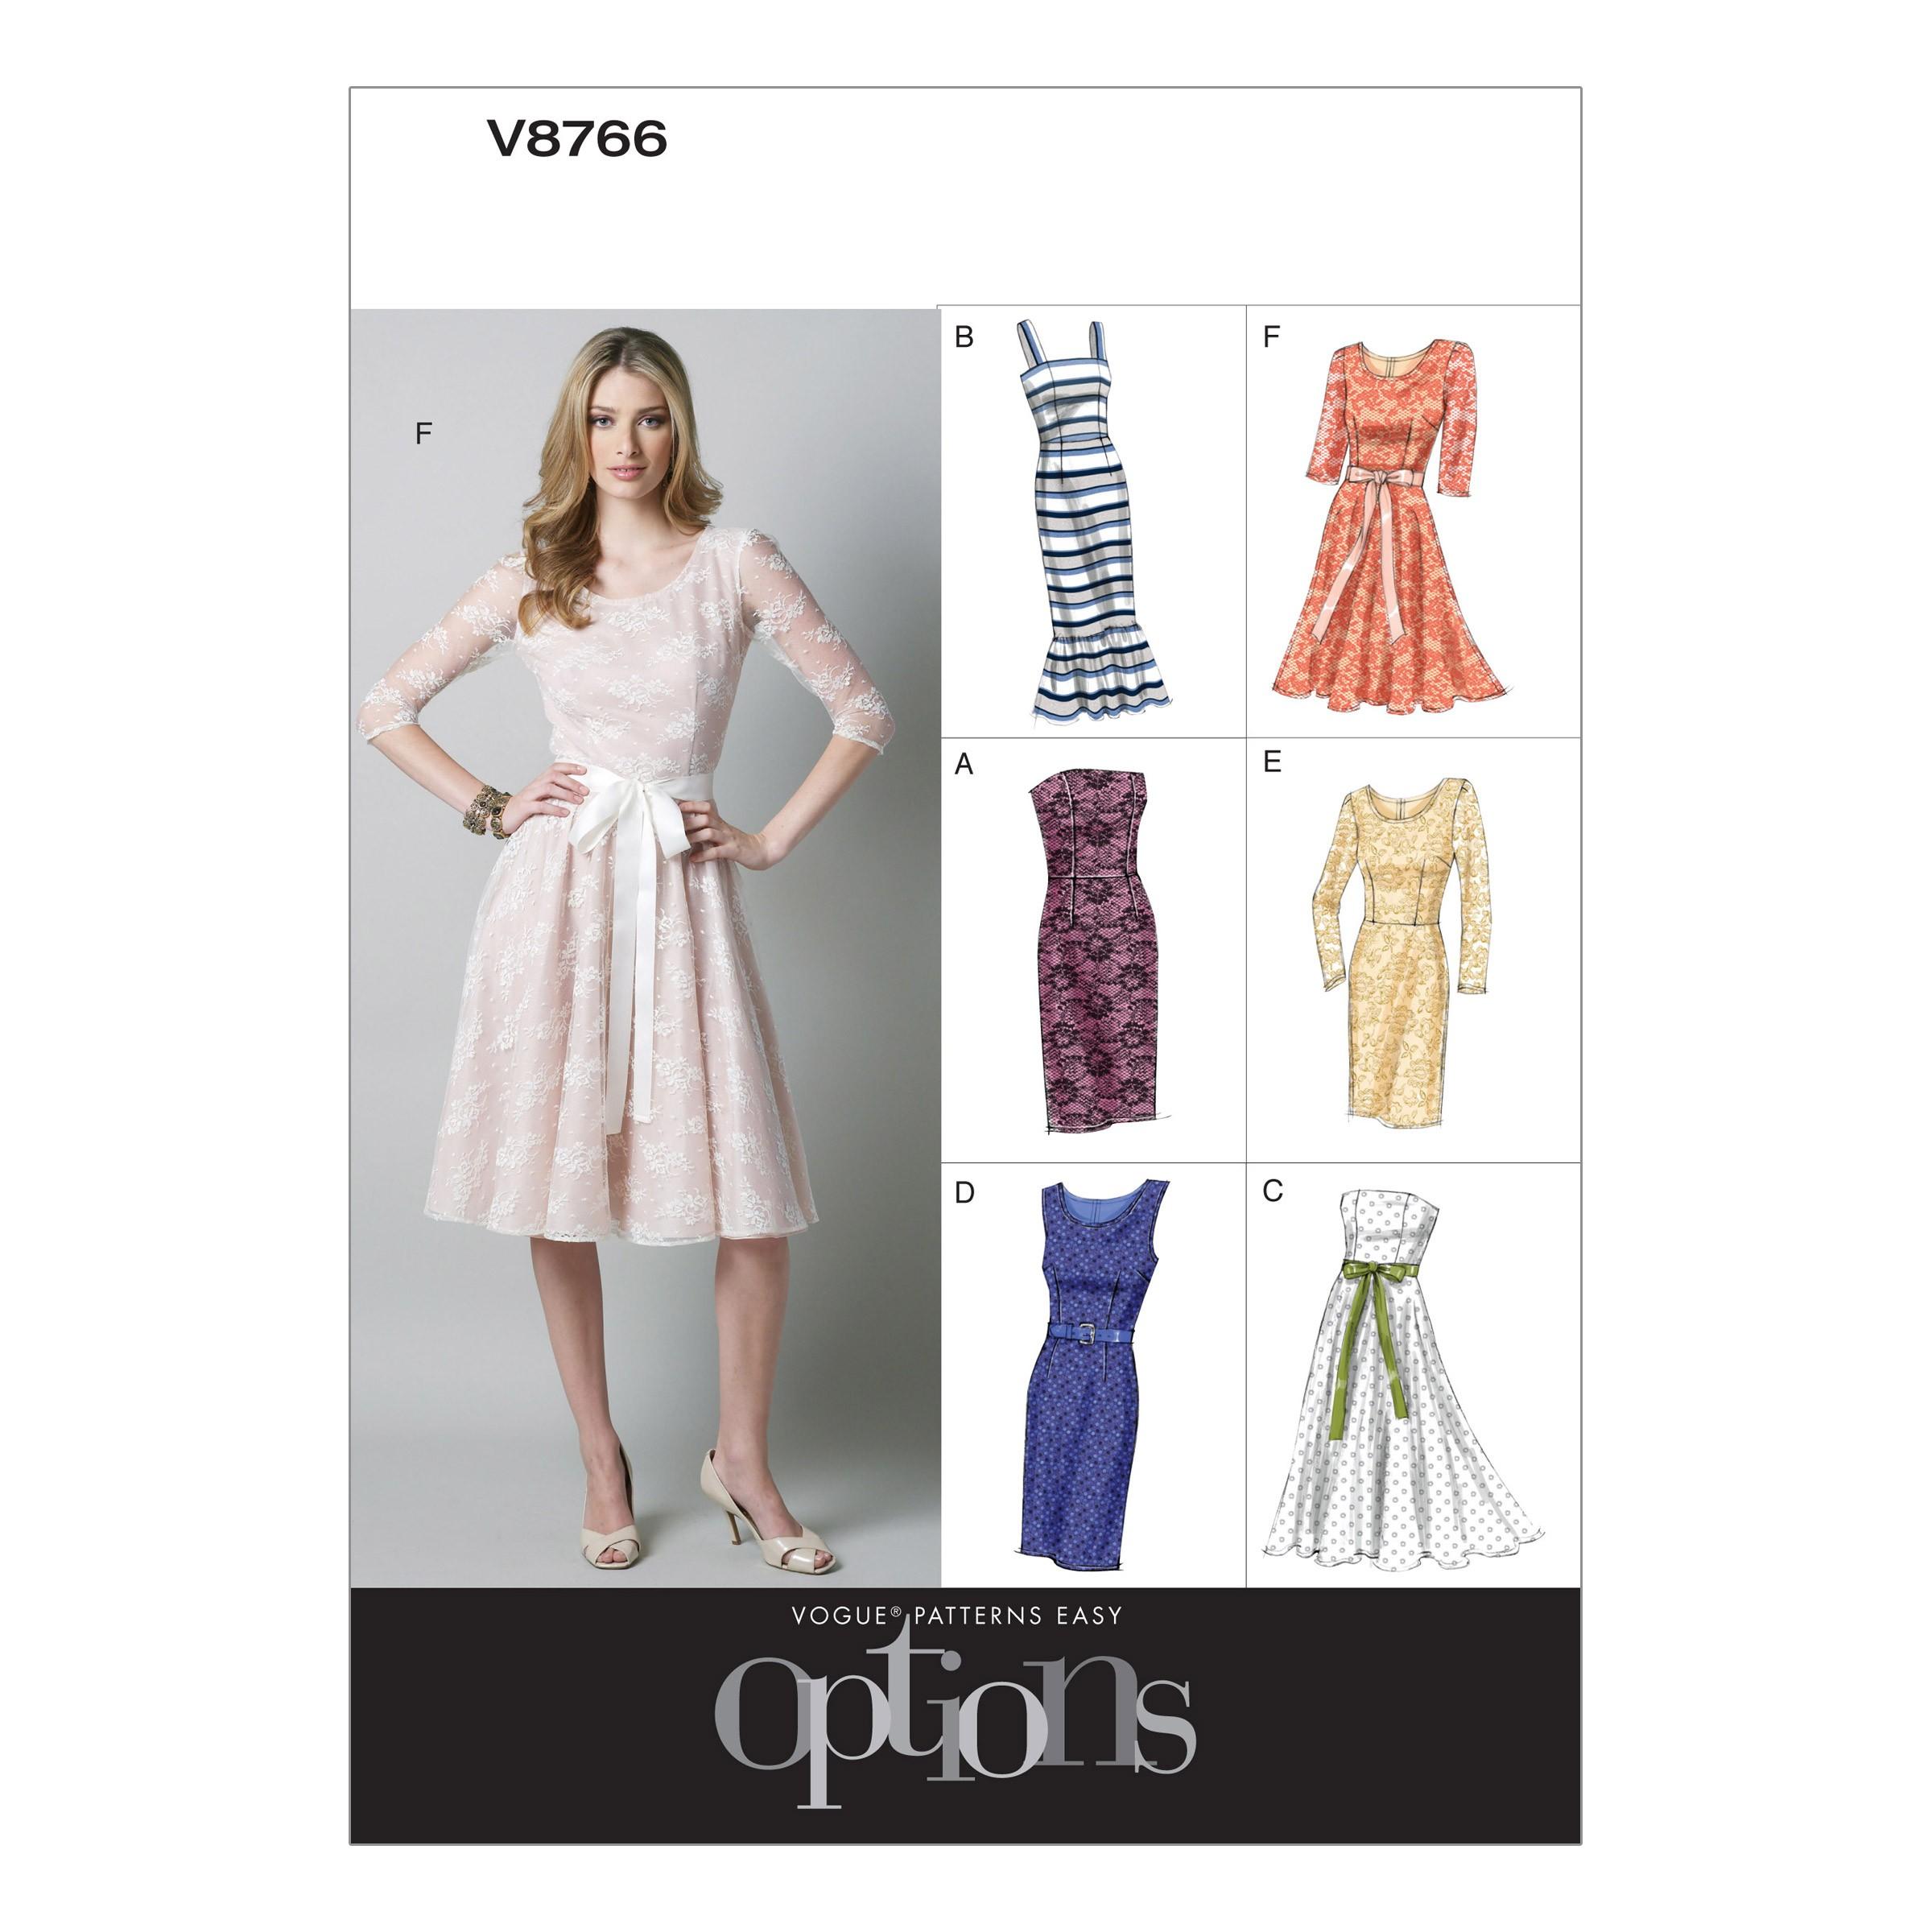 Vogue Sewing Pattern V8766 Women's Petite Dress